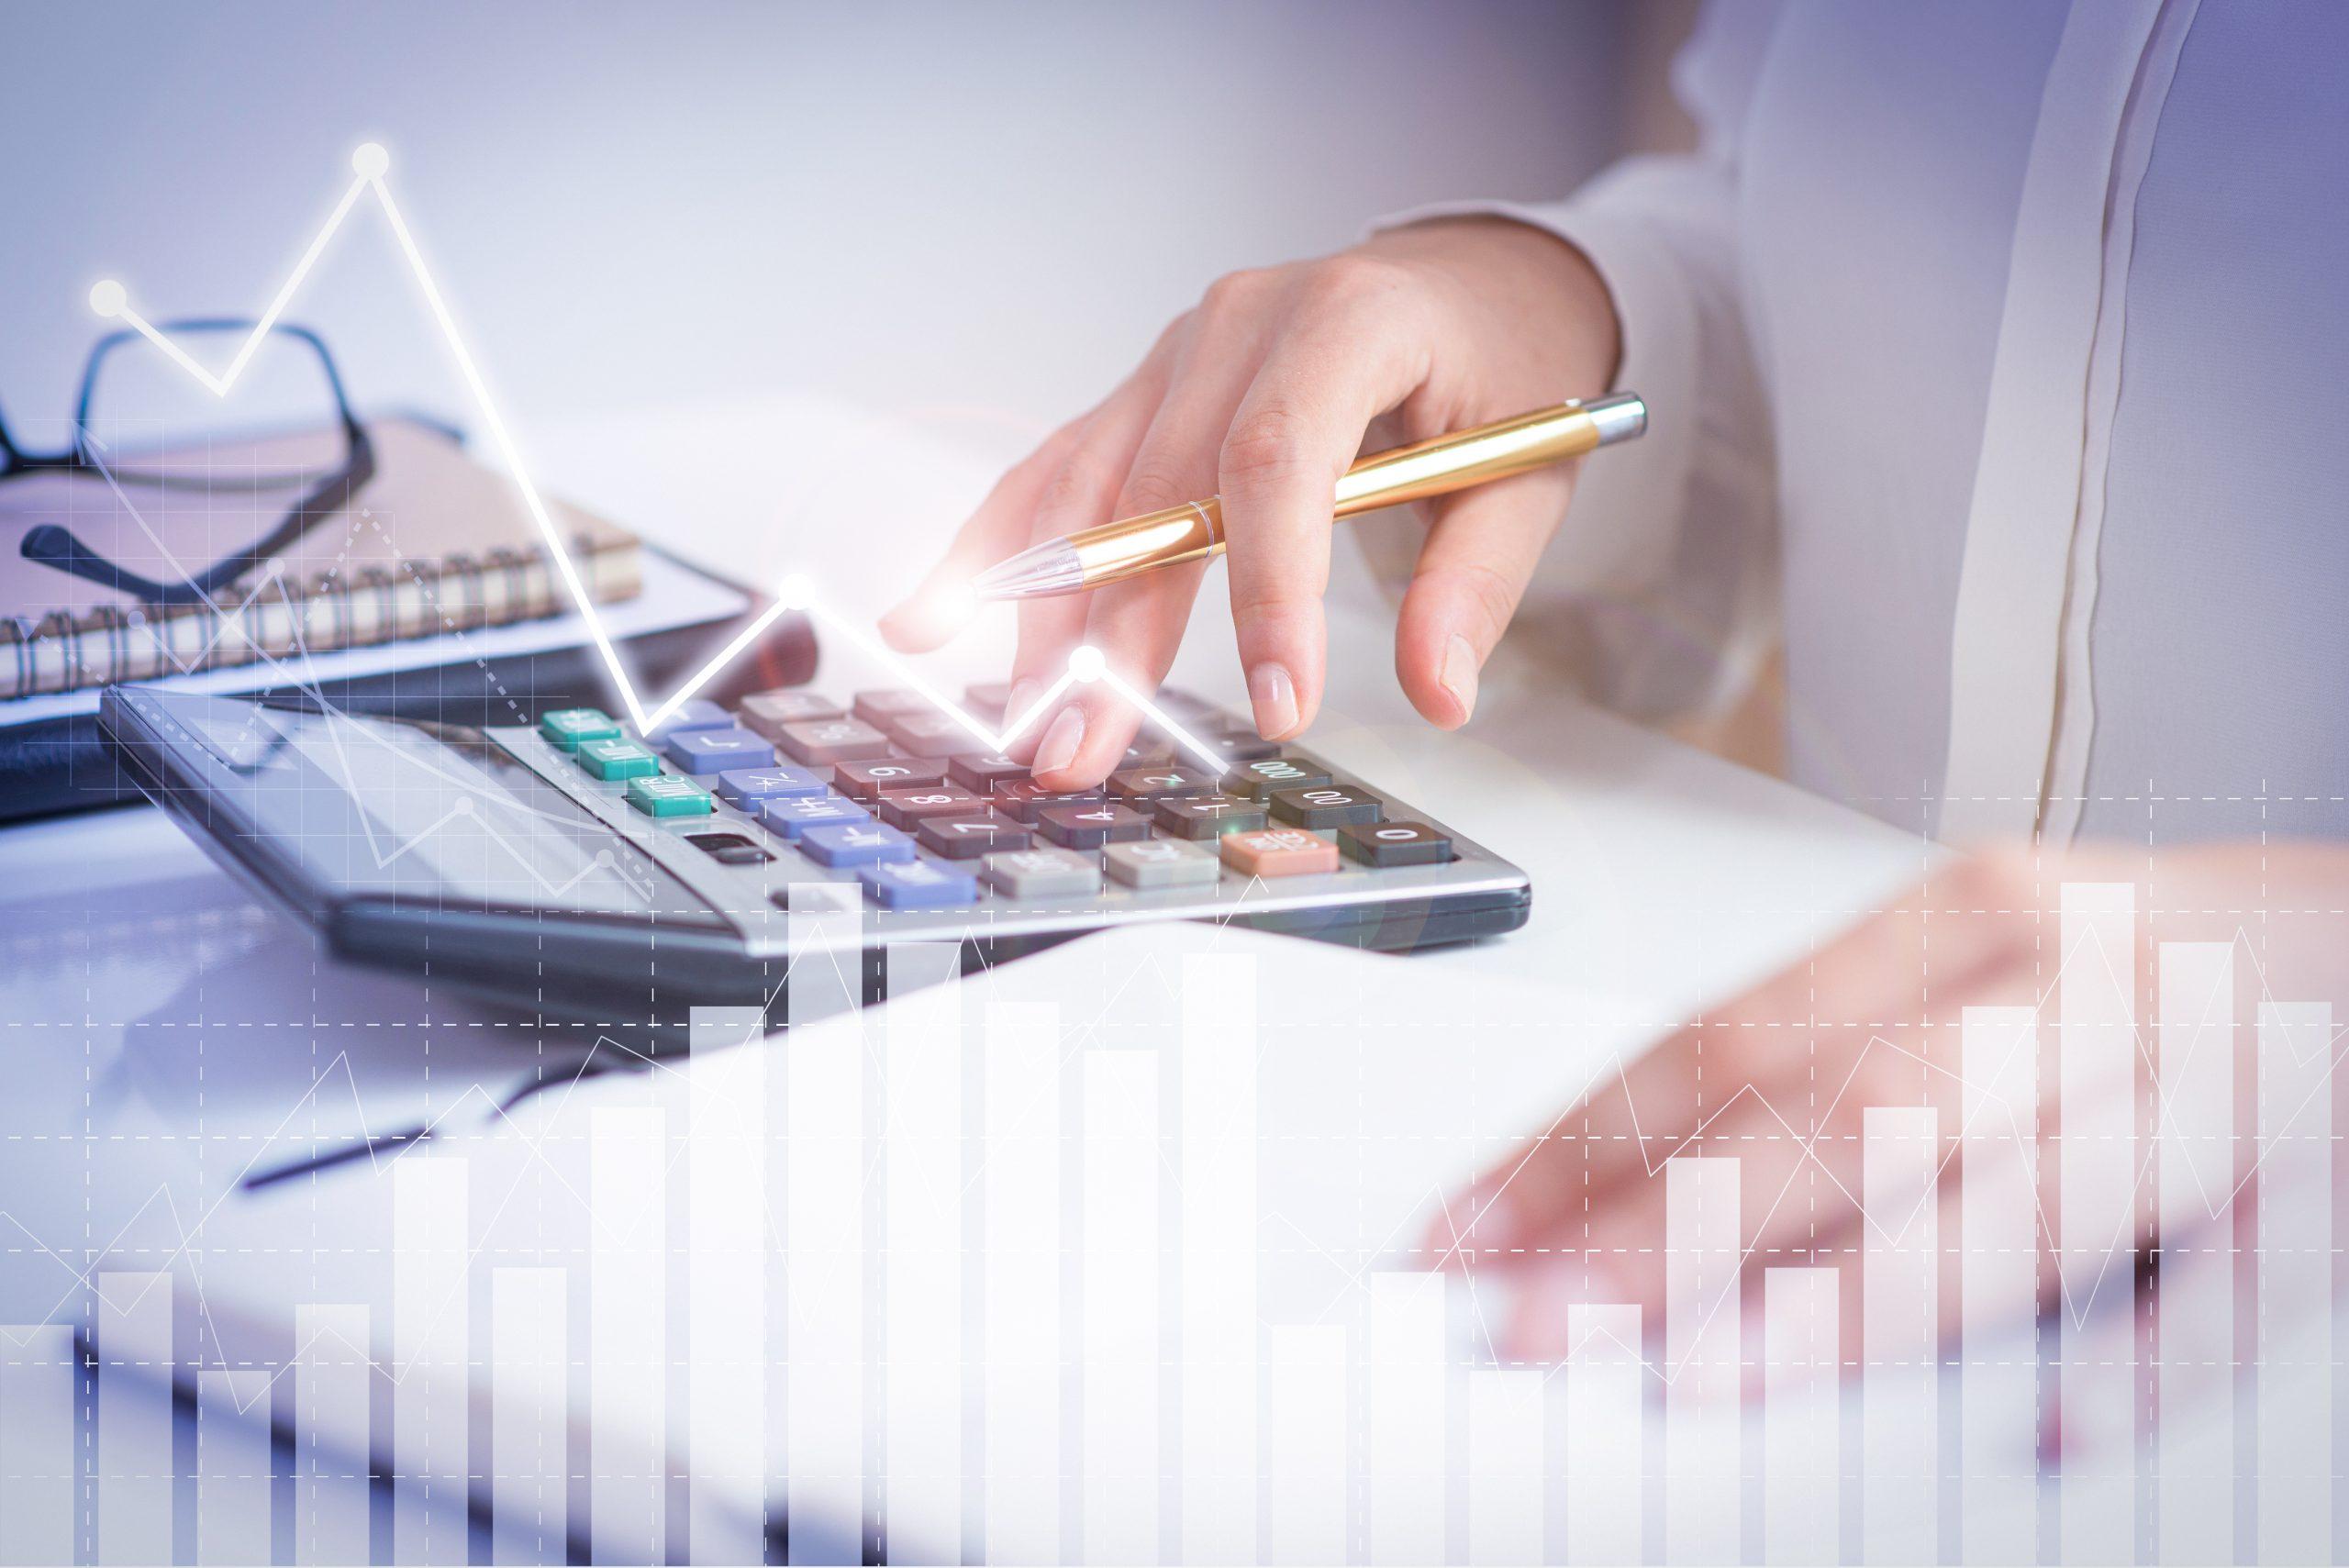 steponestepahead banking